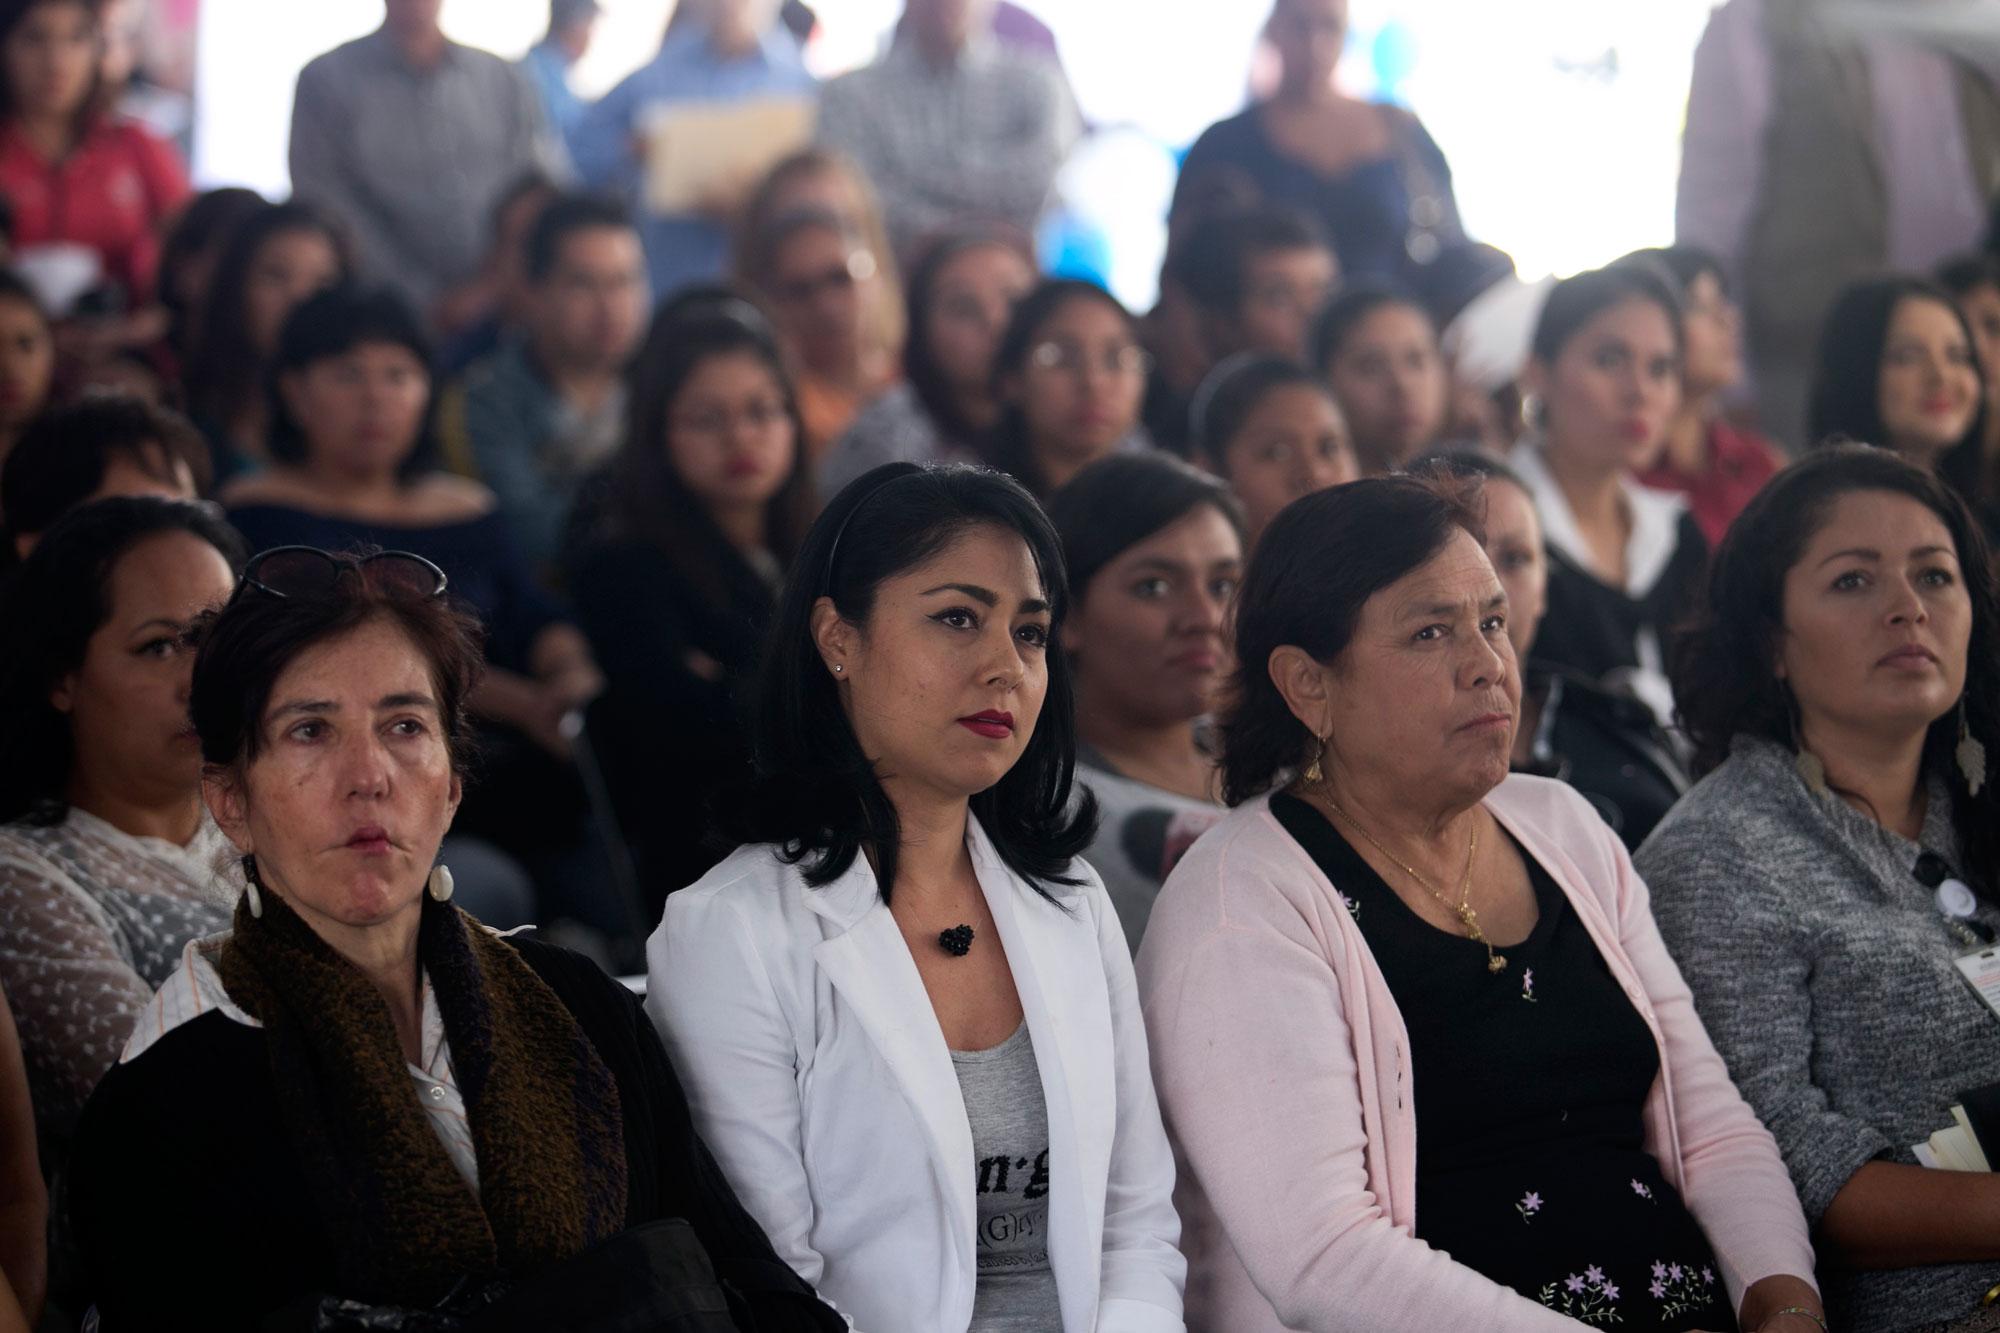 Feria de empleo Mujer emprende 5jpg